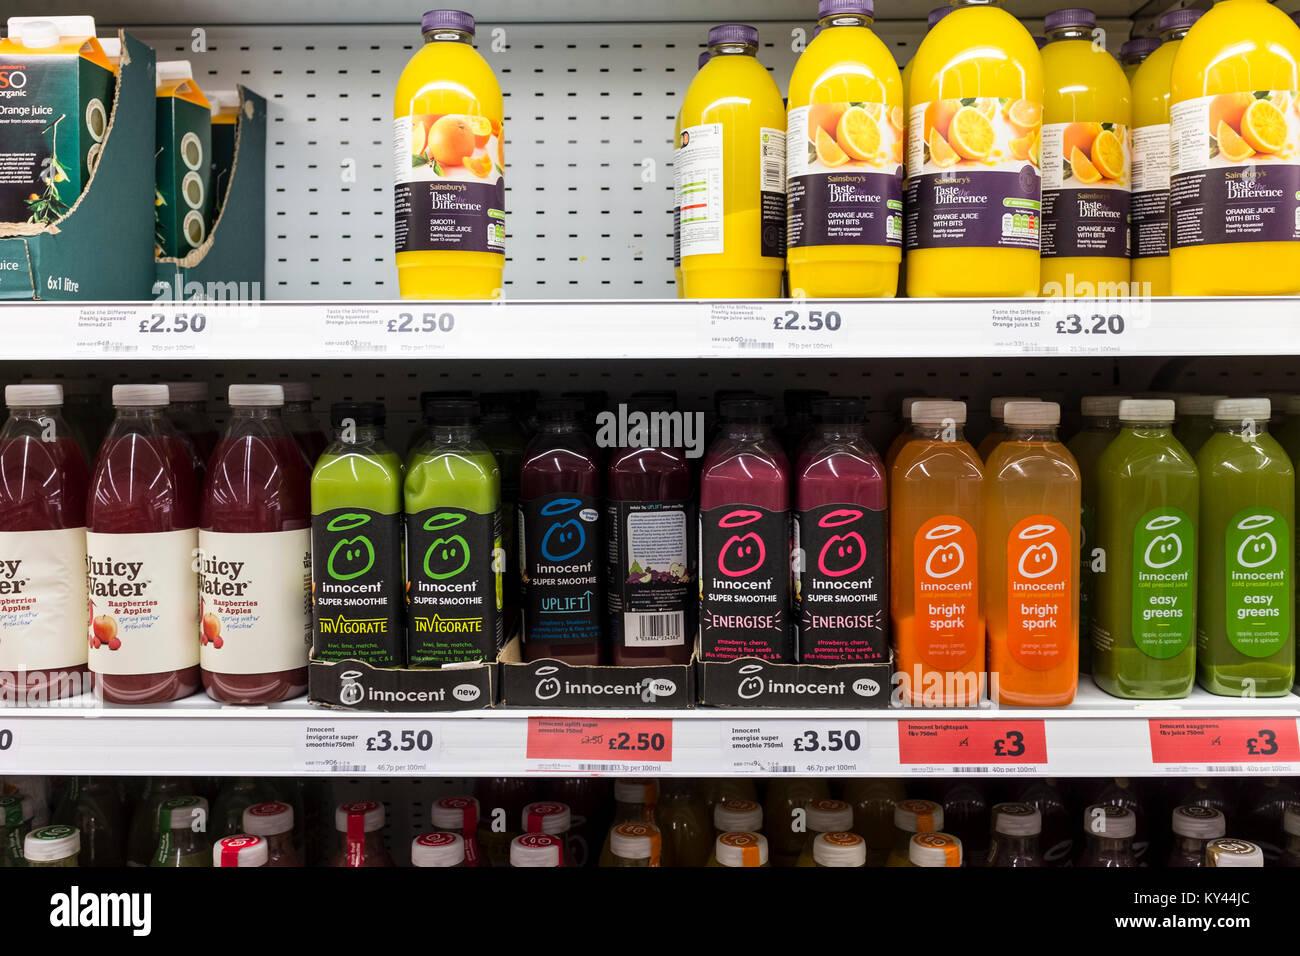 Innocent smoothie and other fruit juices bottles on display on supermarket shelves, UK - Stock Image